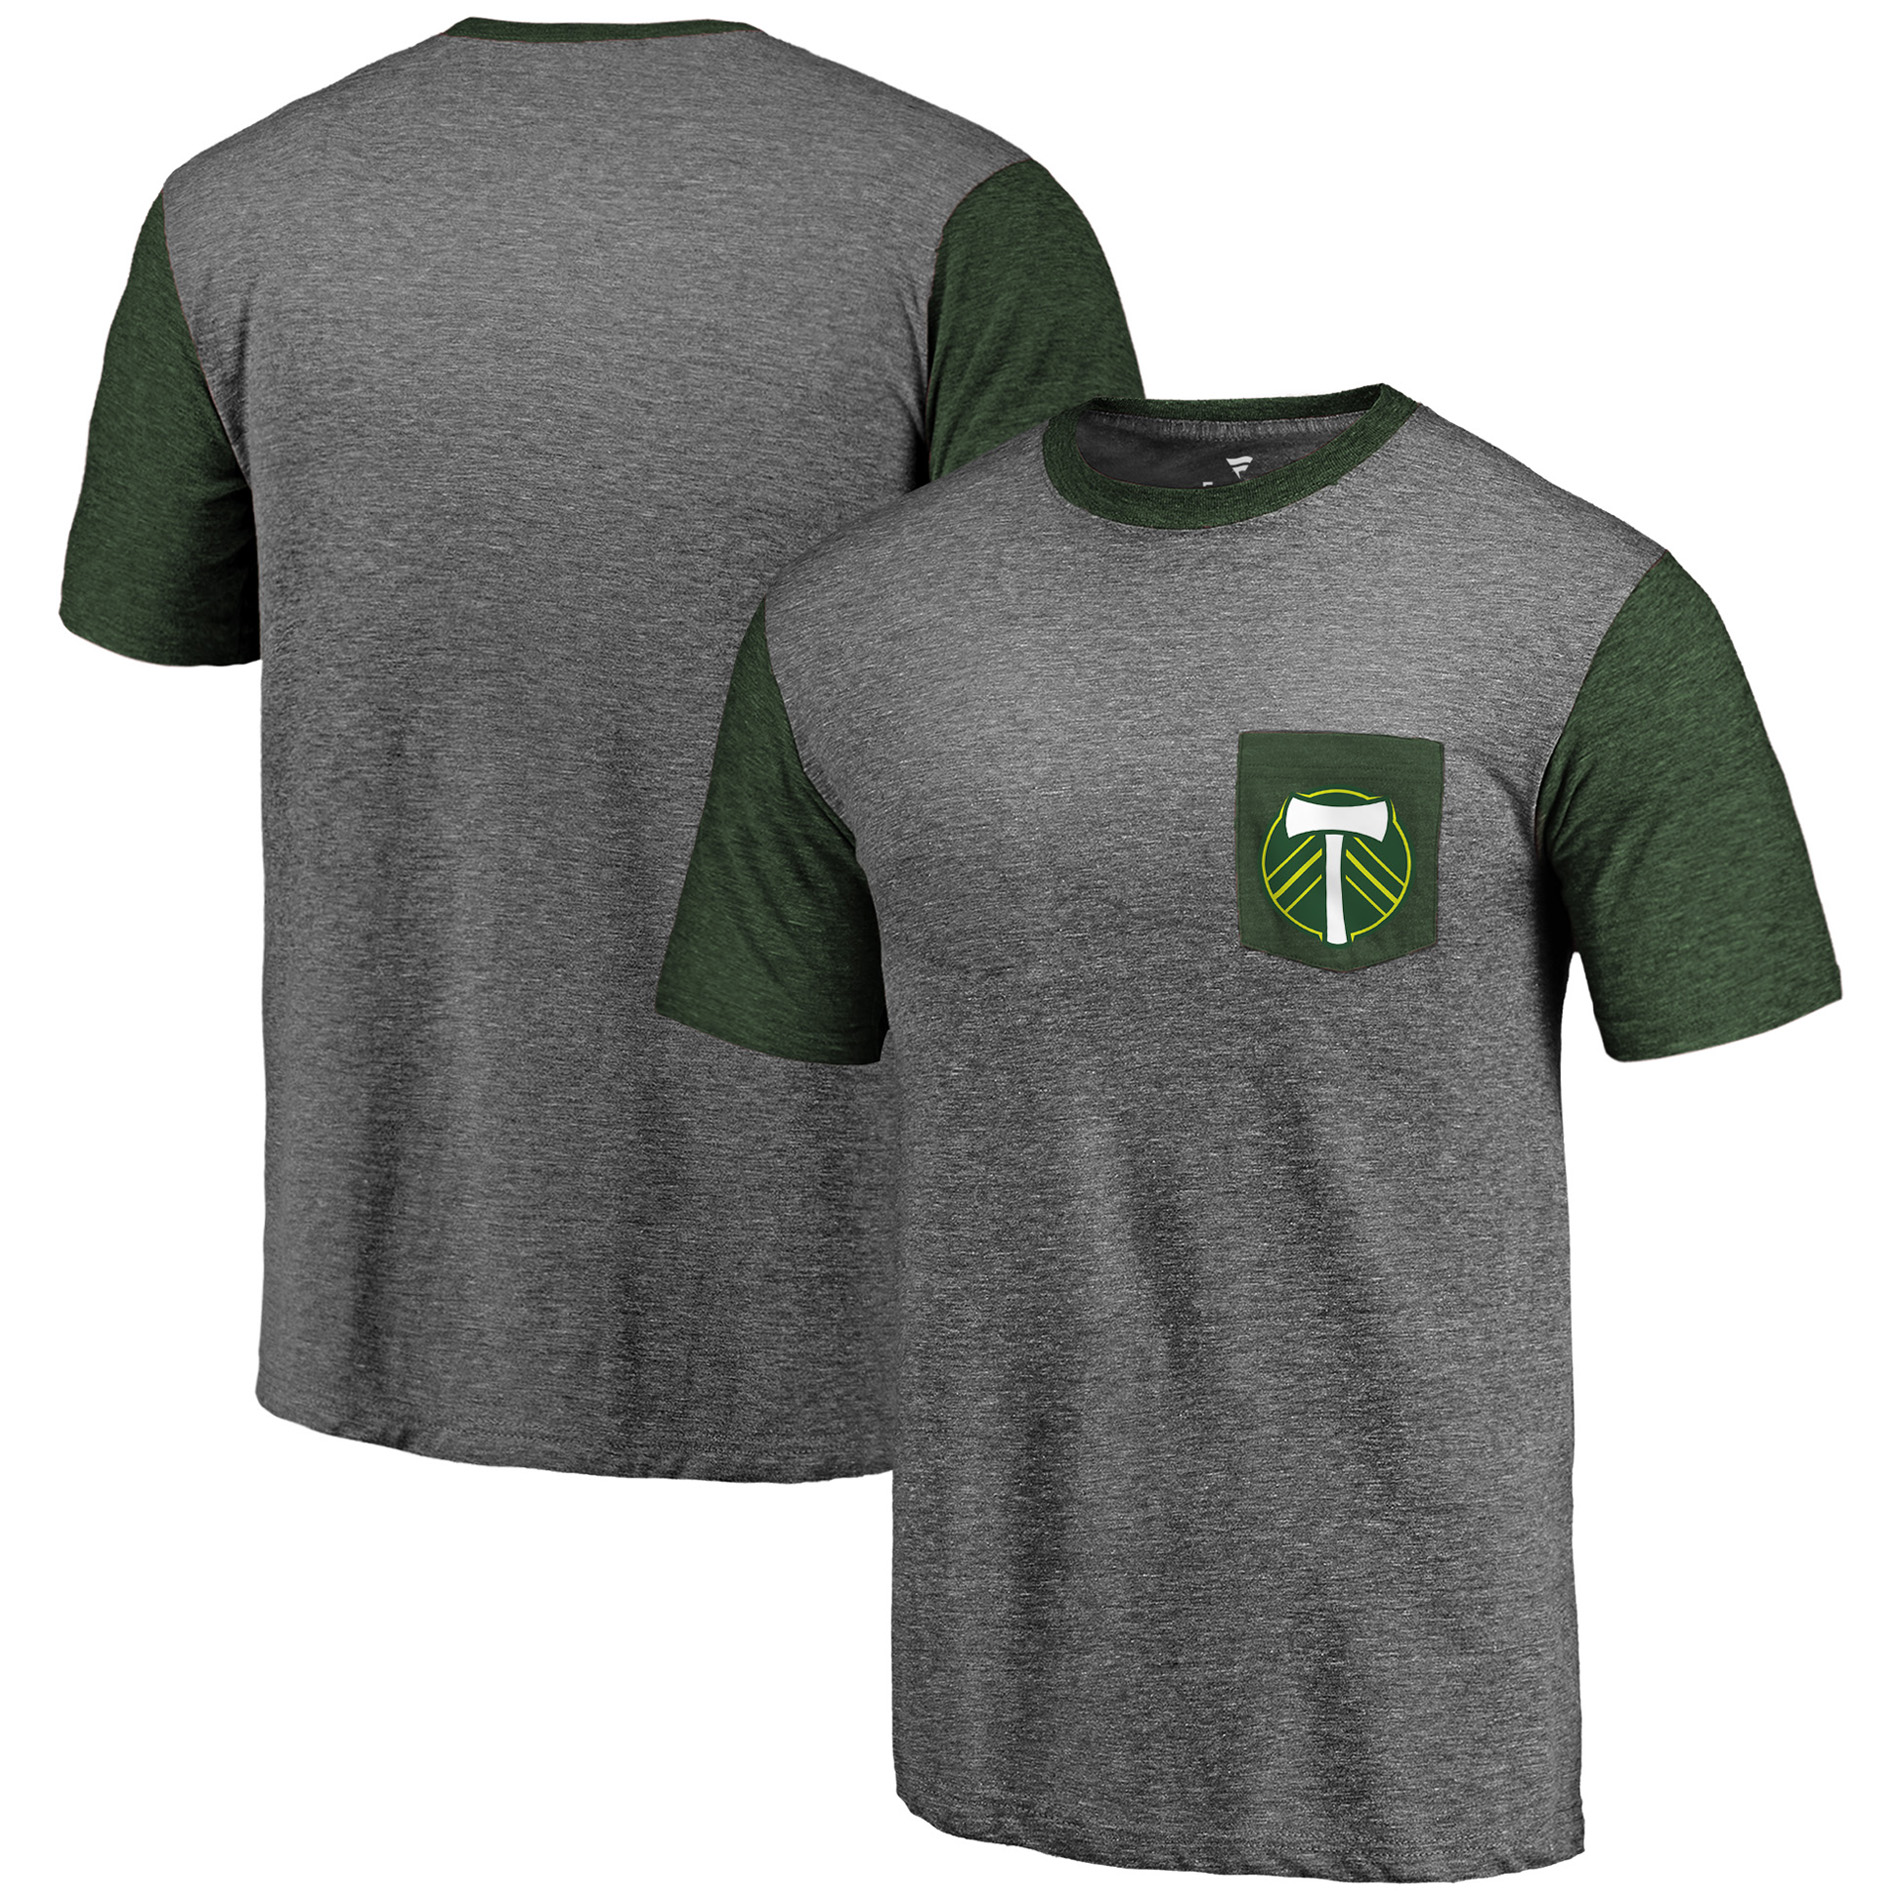 Portland Timbers Fanatics Branded Tri-Blend Pocket T-Shirt - Heathered Gray/Green